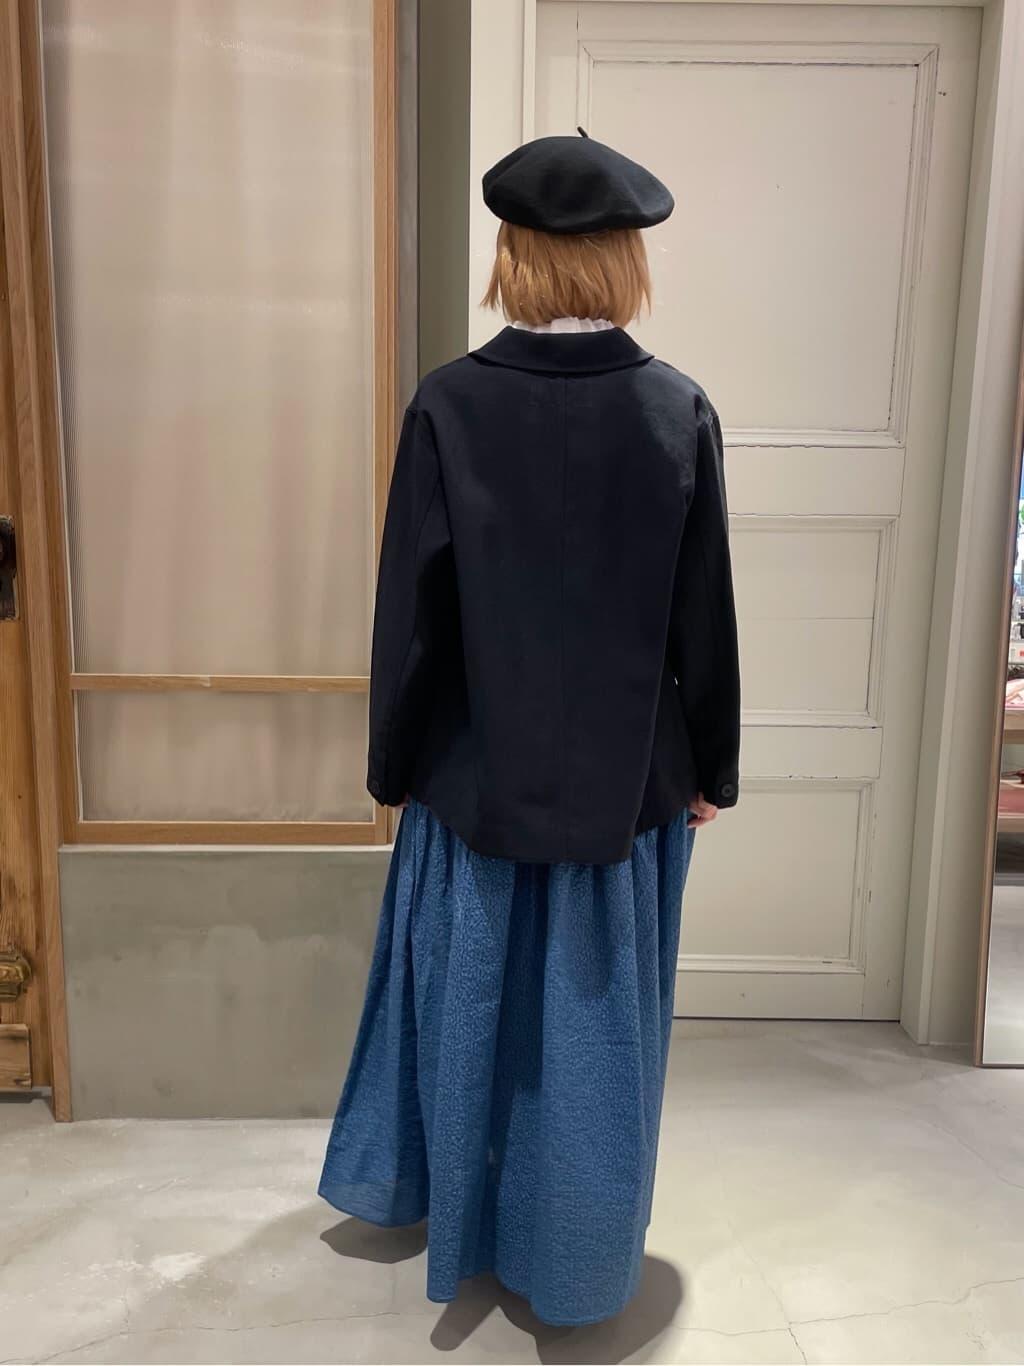 bulle de savon 渋谷スクランブルスクエア 身長:154cm 2021.09.10